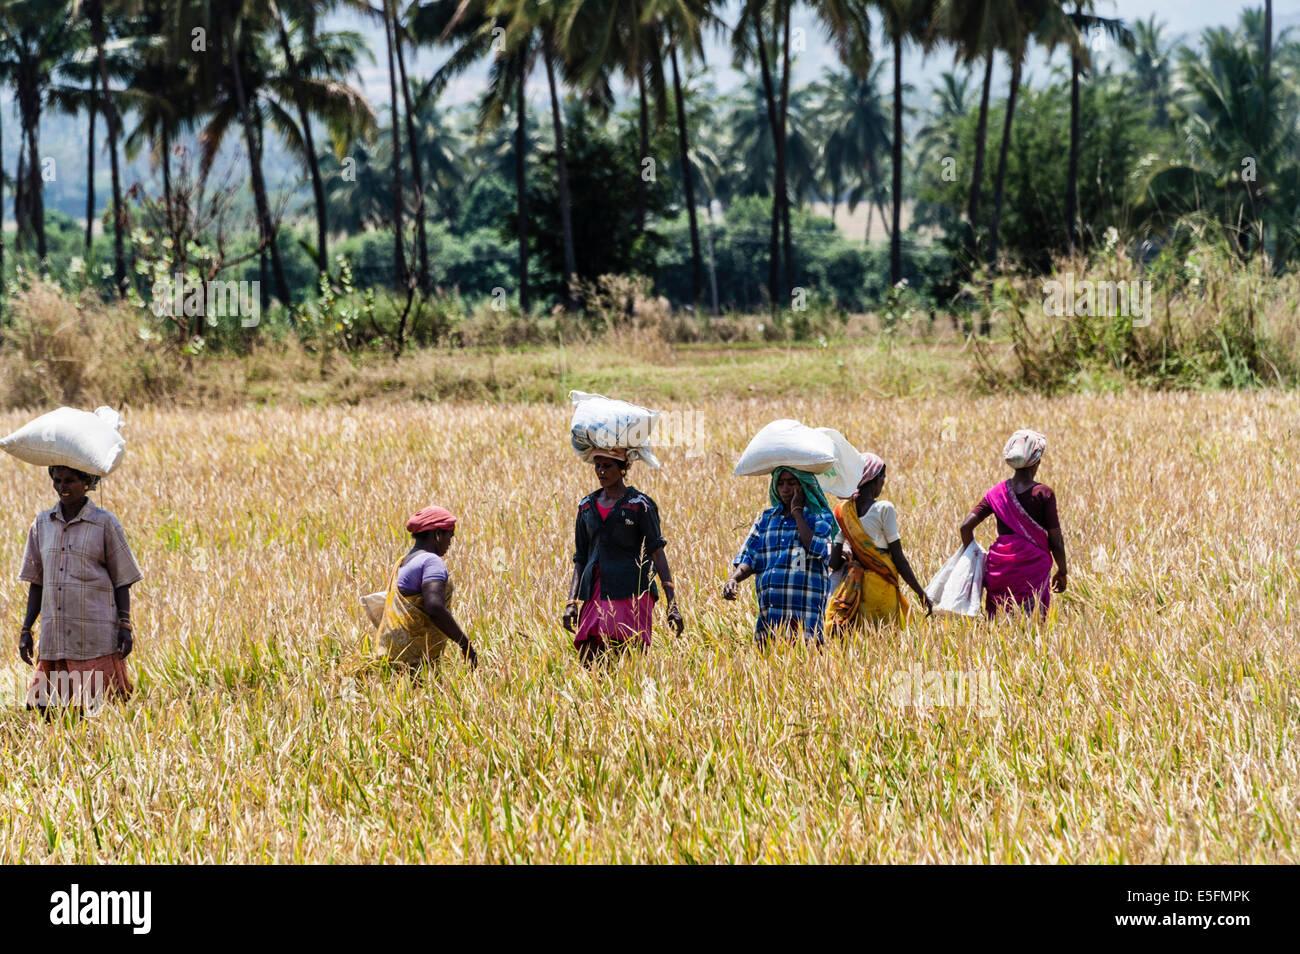 Indian women carrying sacks of rice on their heads on a field, Uttamapalaiyam, Tamil Nadu, India - Stock Image